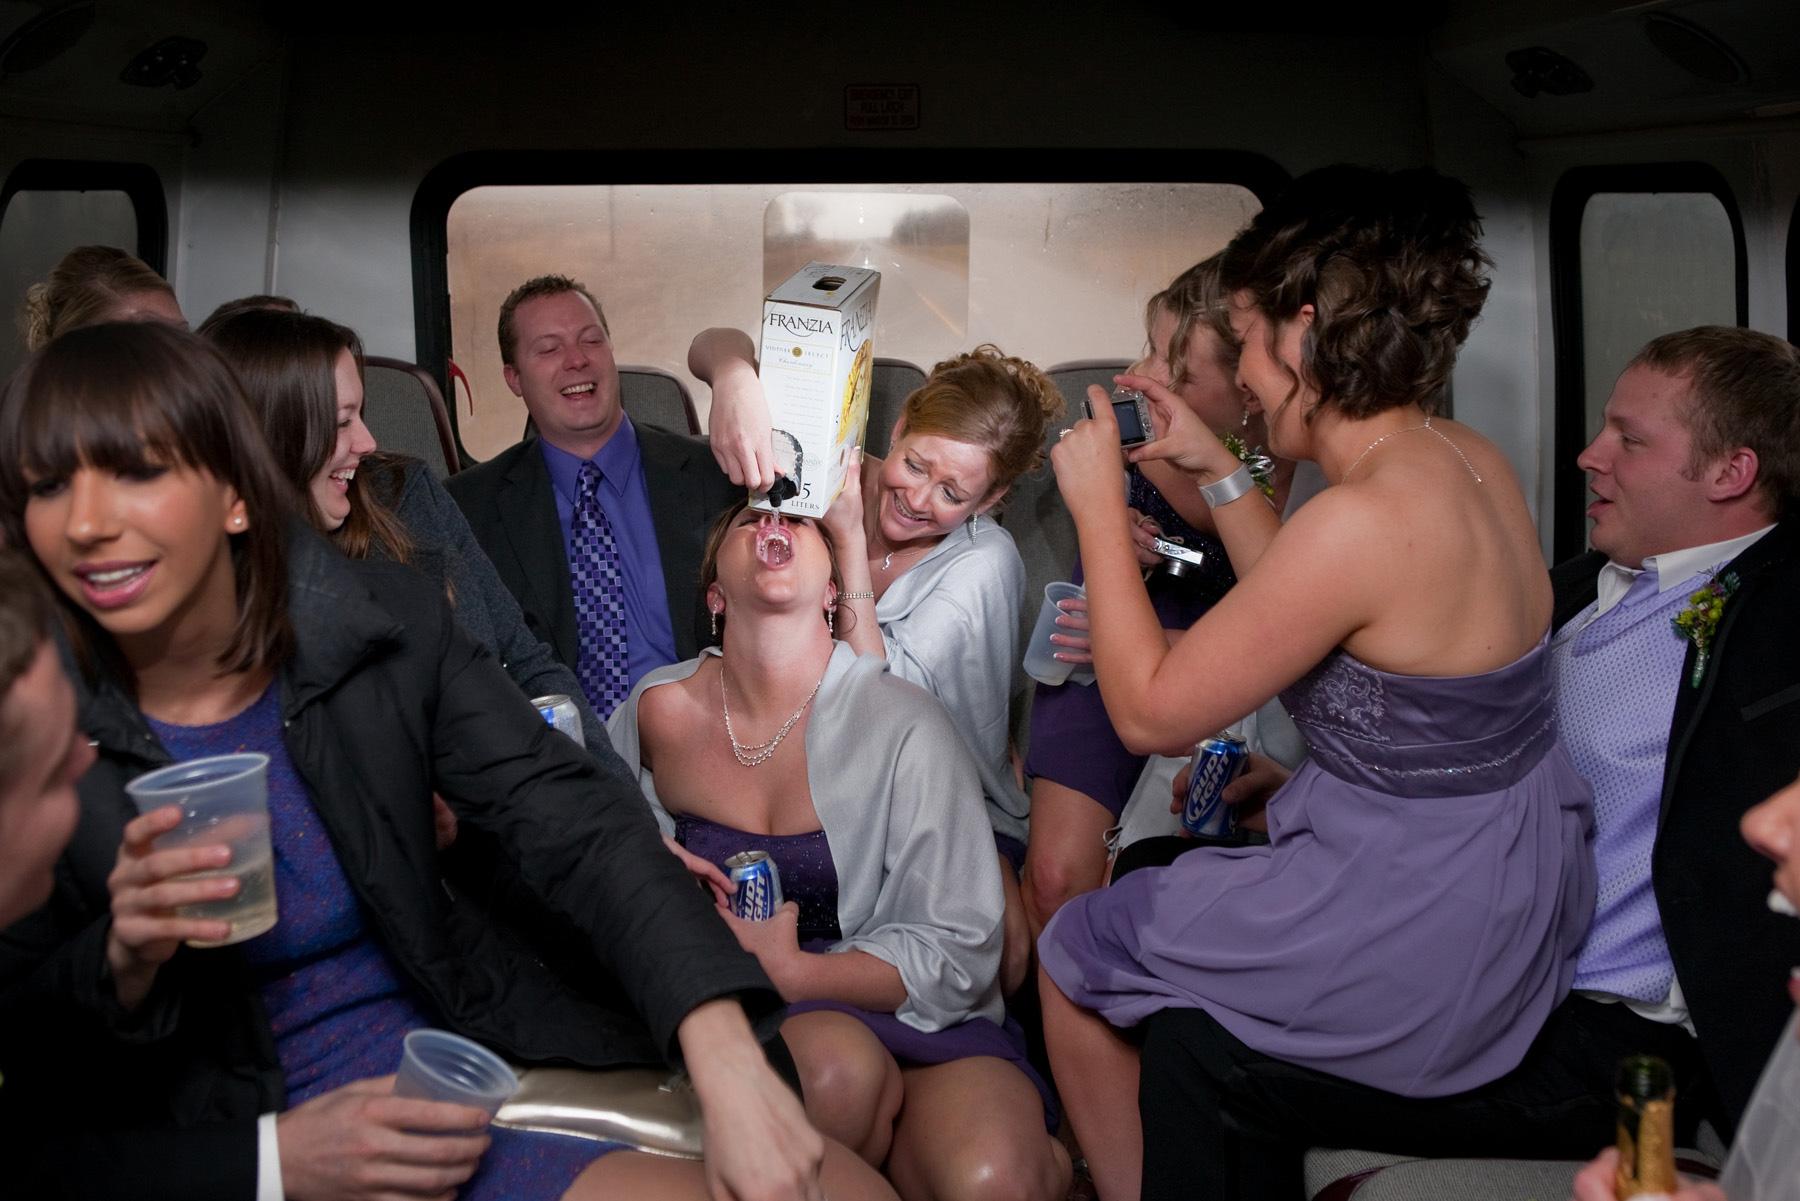 wedding-photography-saint-paul-mark-kegans-627.jpg